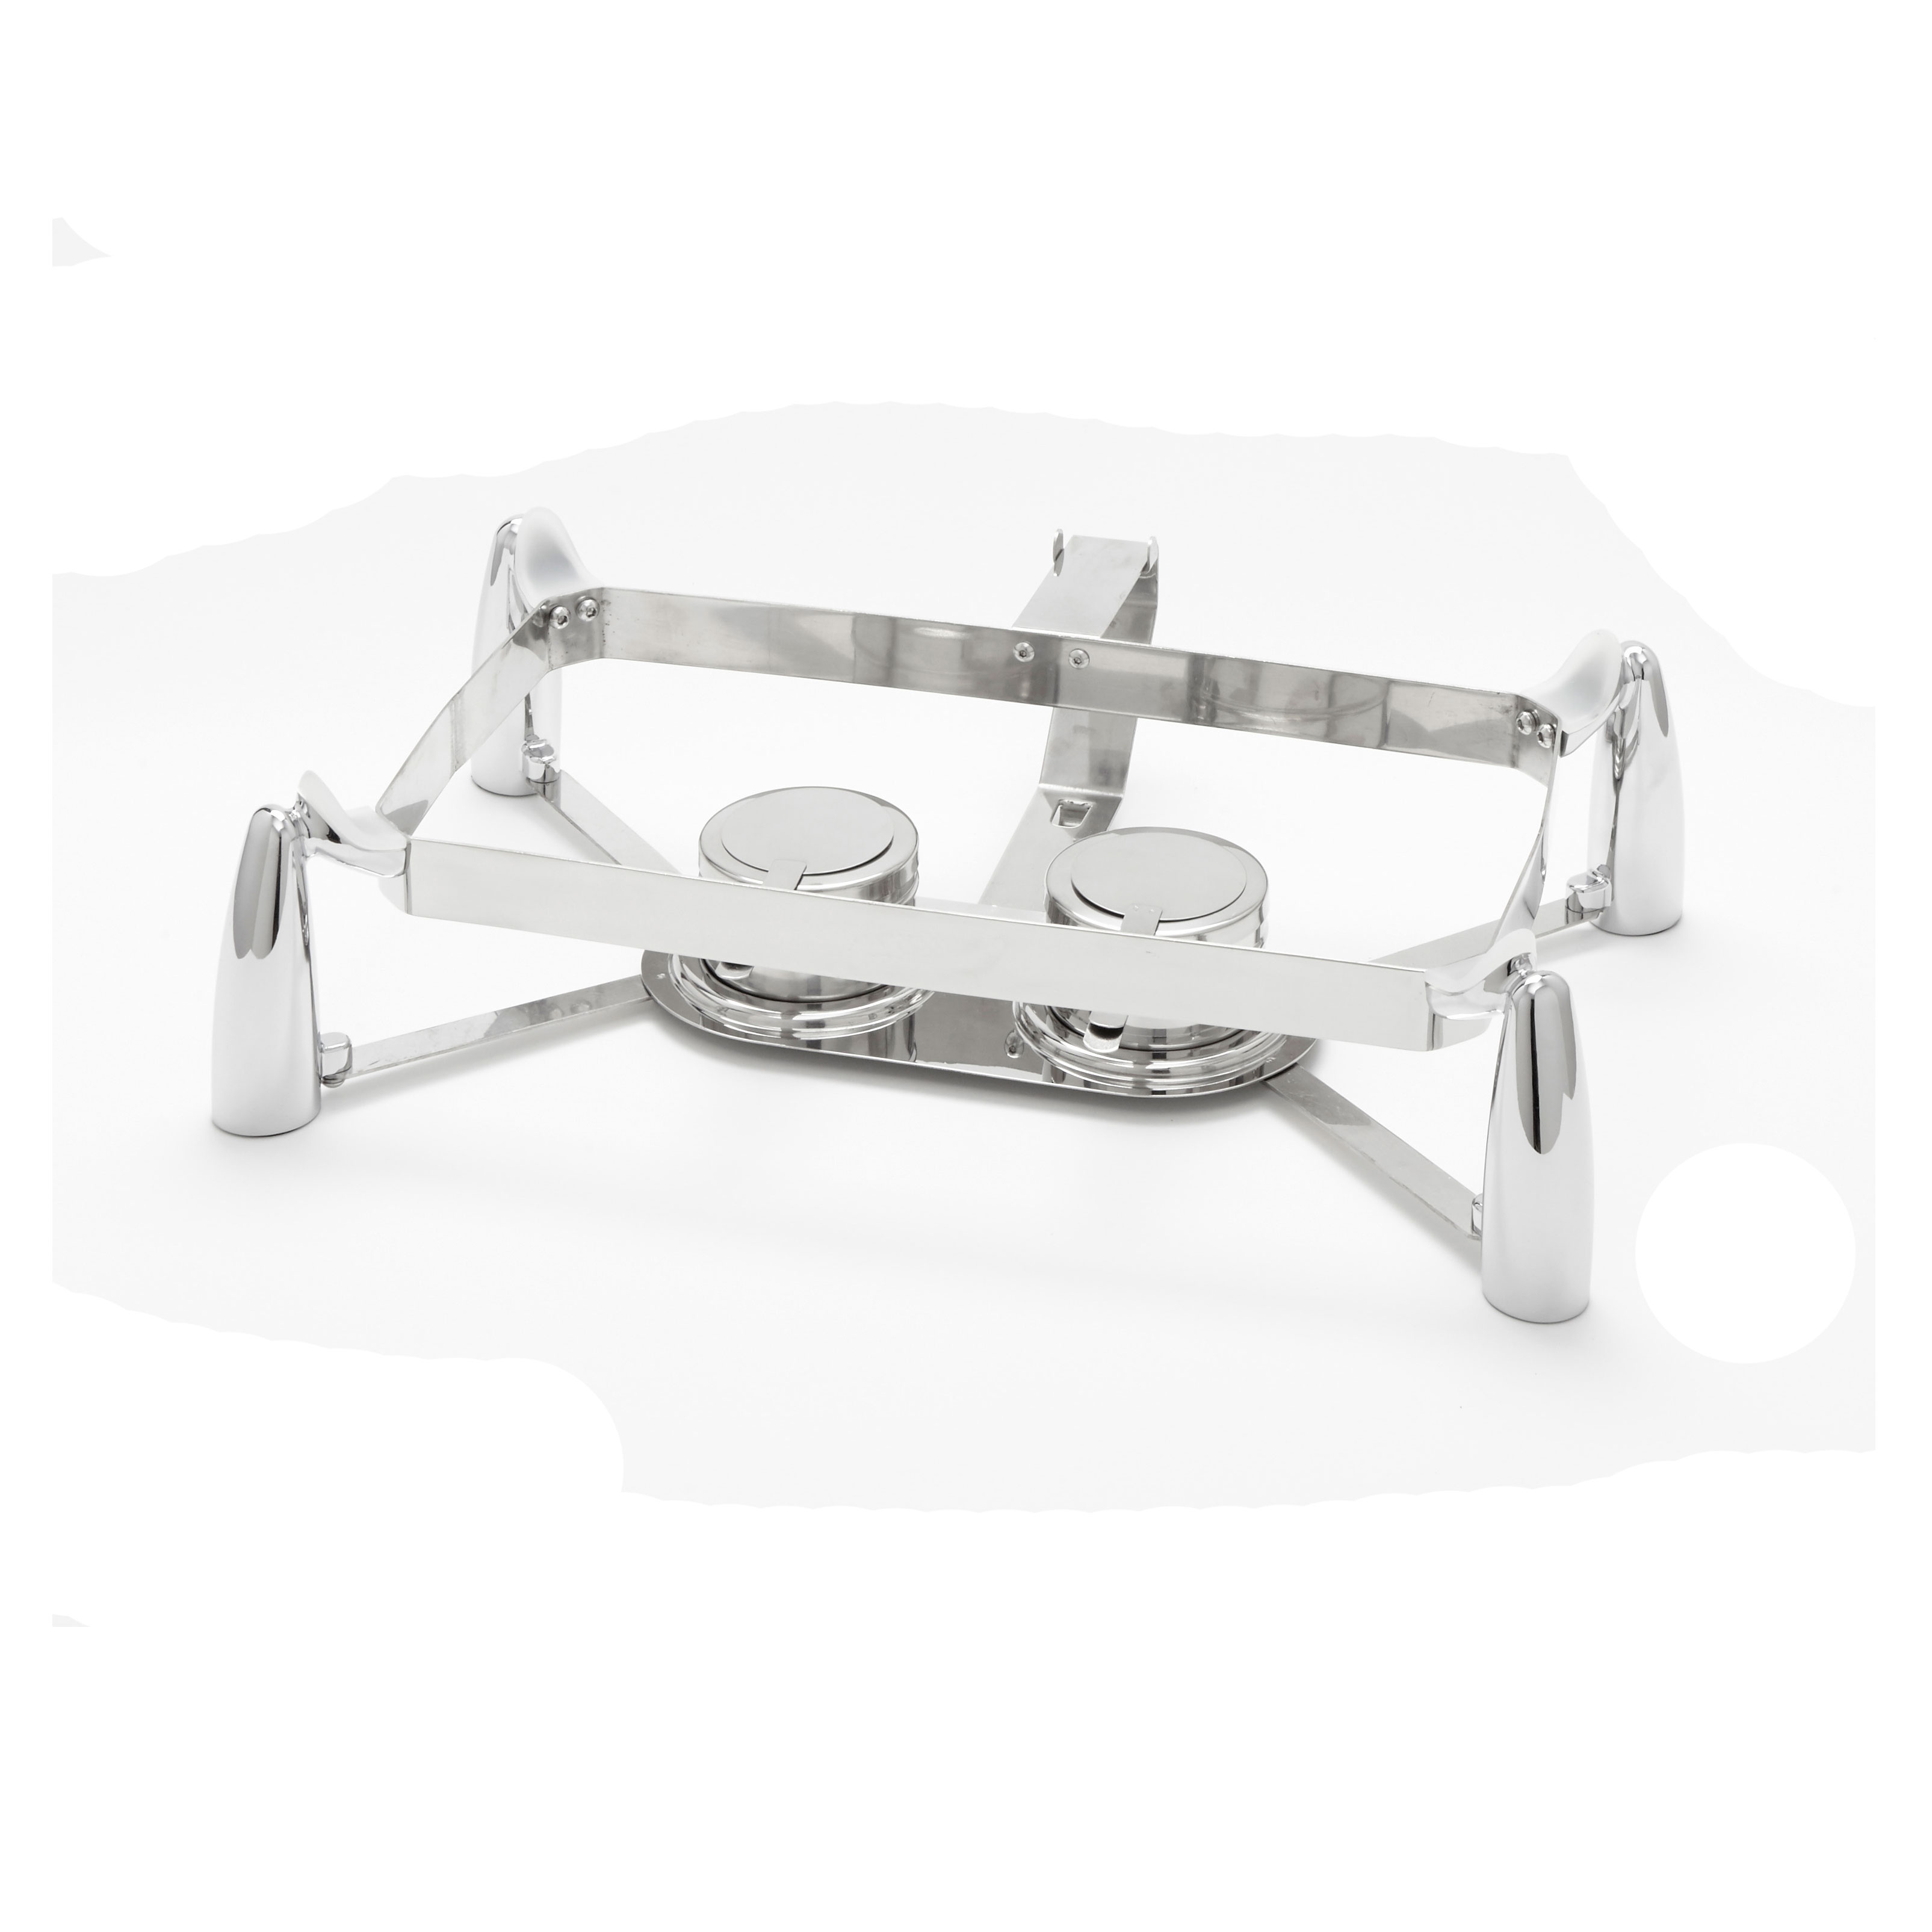 American Metalcraft REVLRT26BASE chafing dish frame / stand